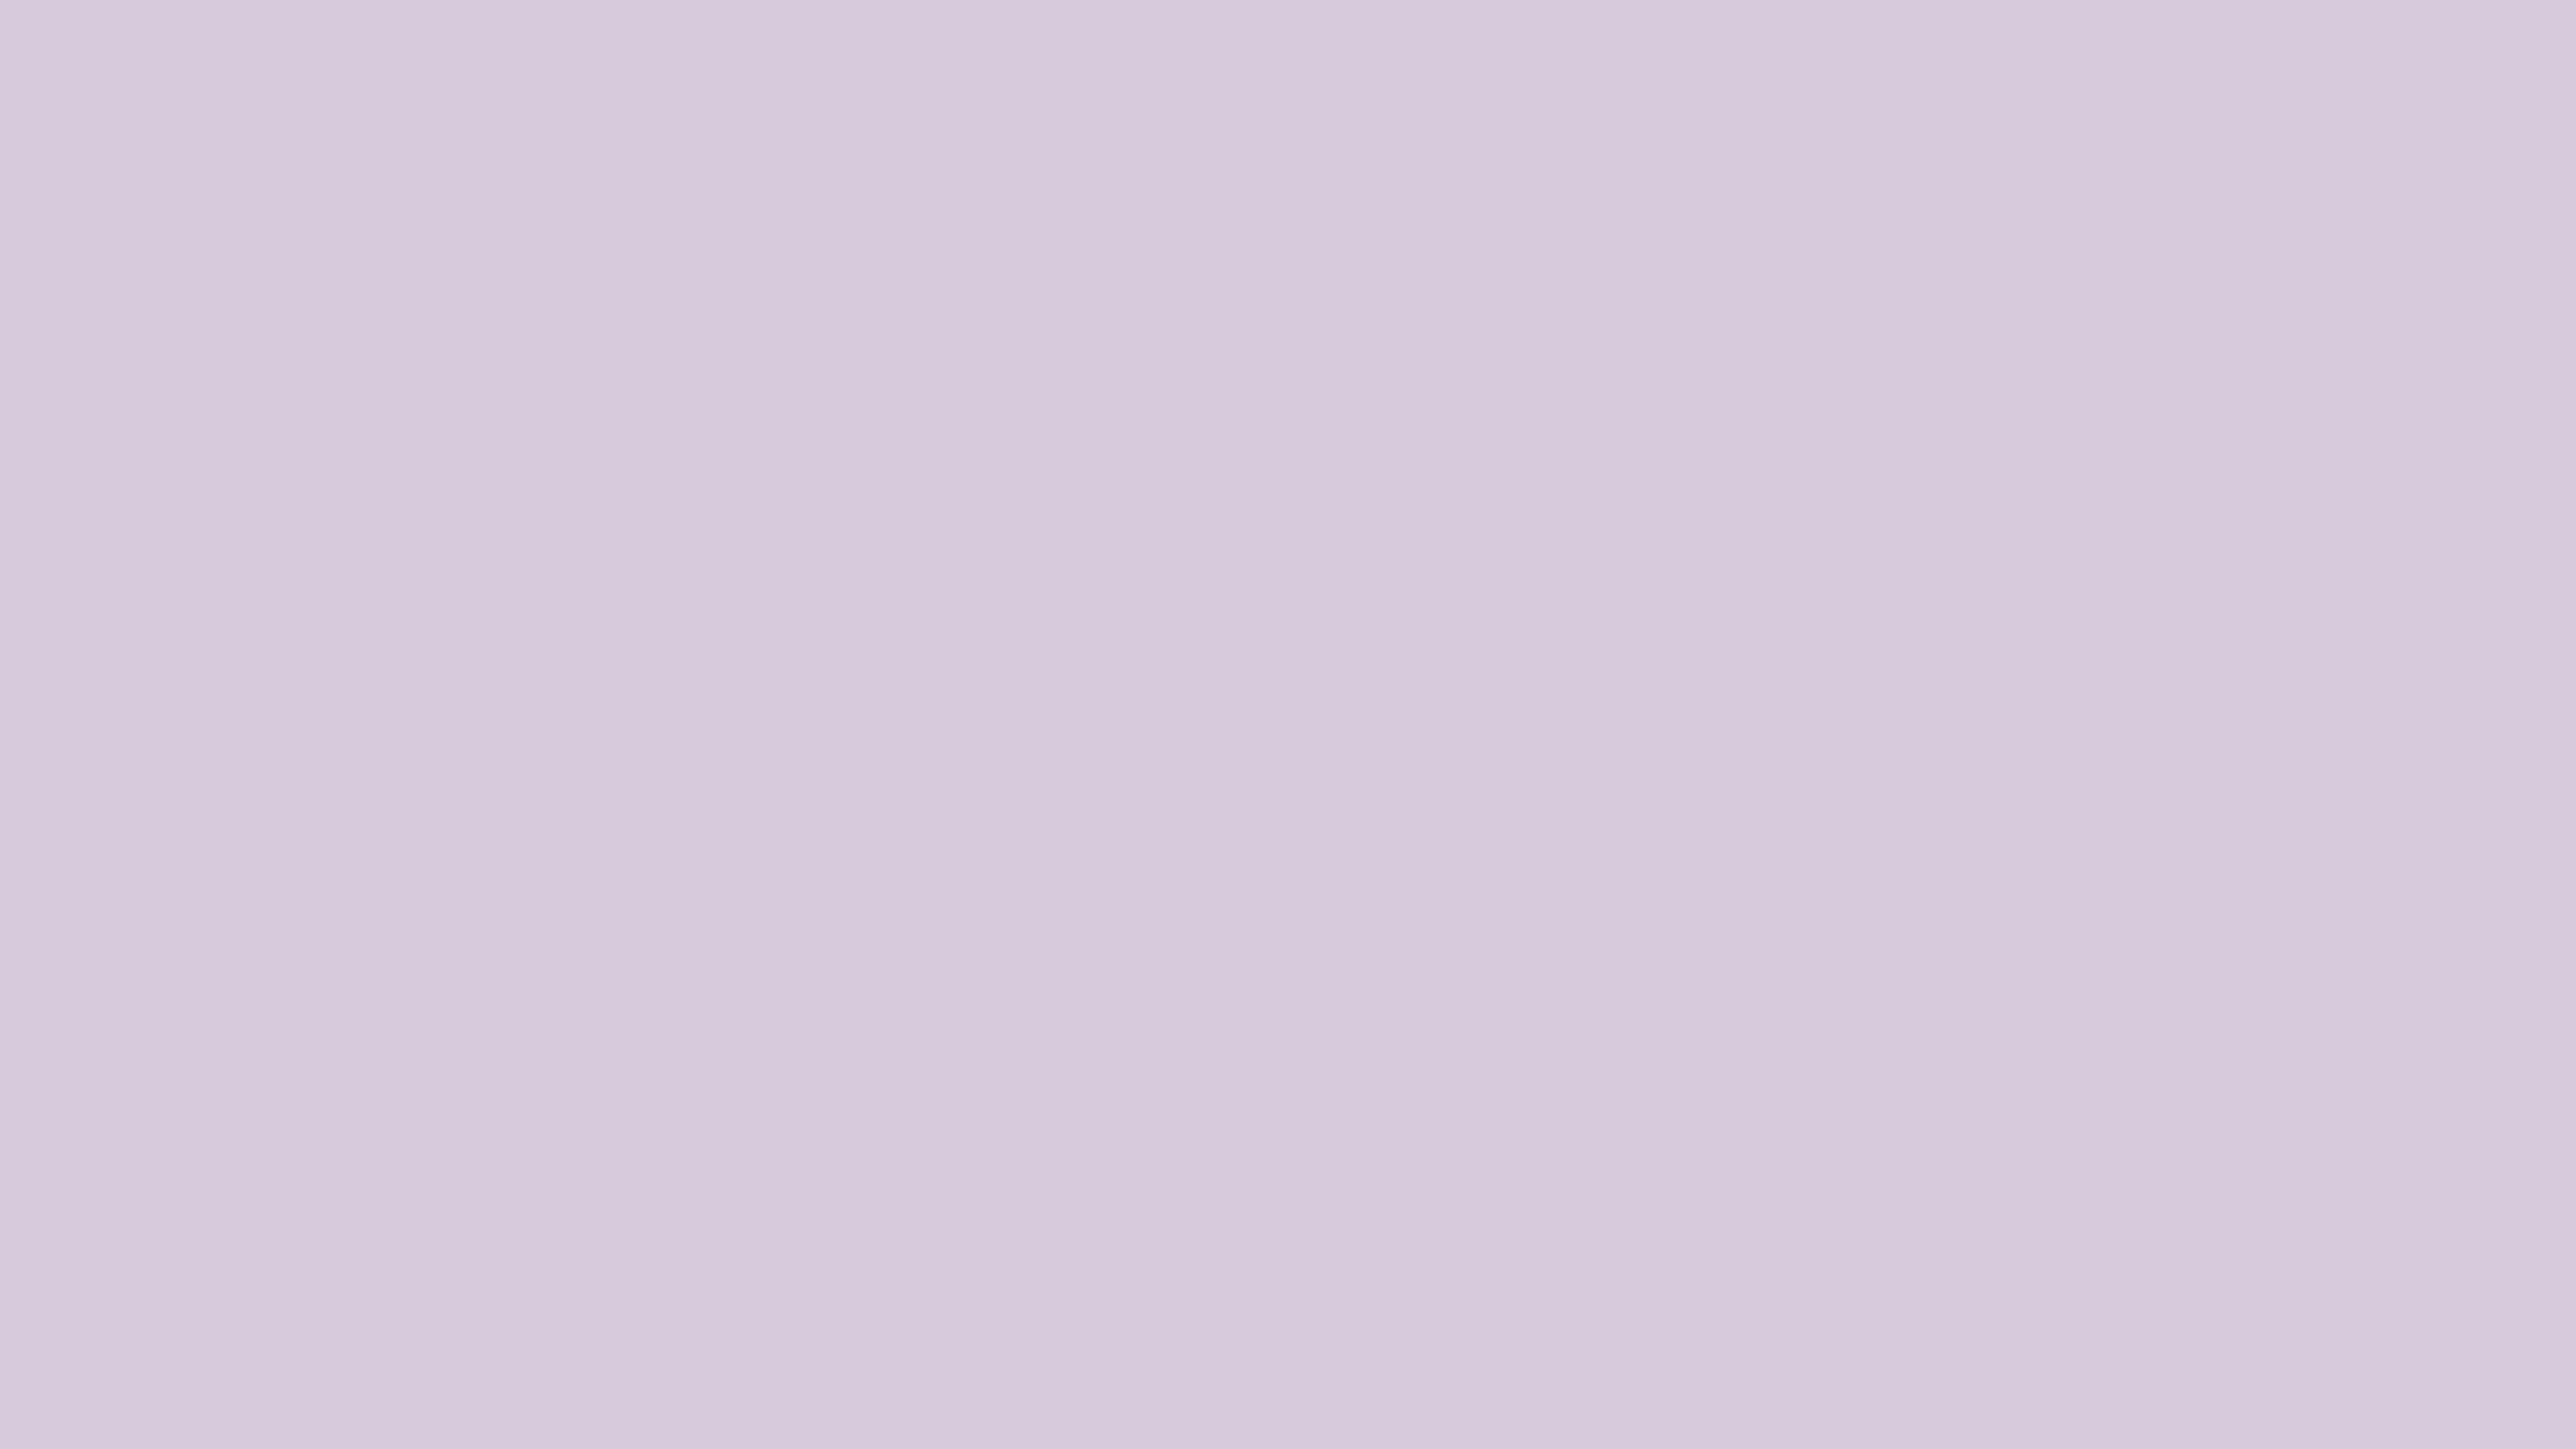 4096x2304 Languid Lavender Solid Color Background